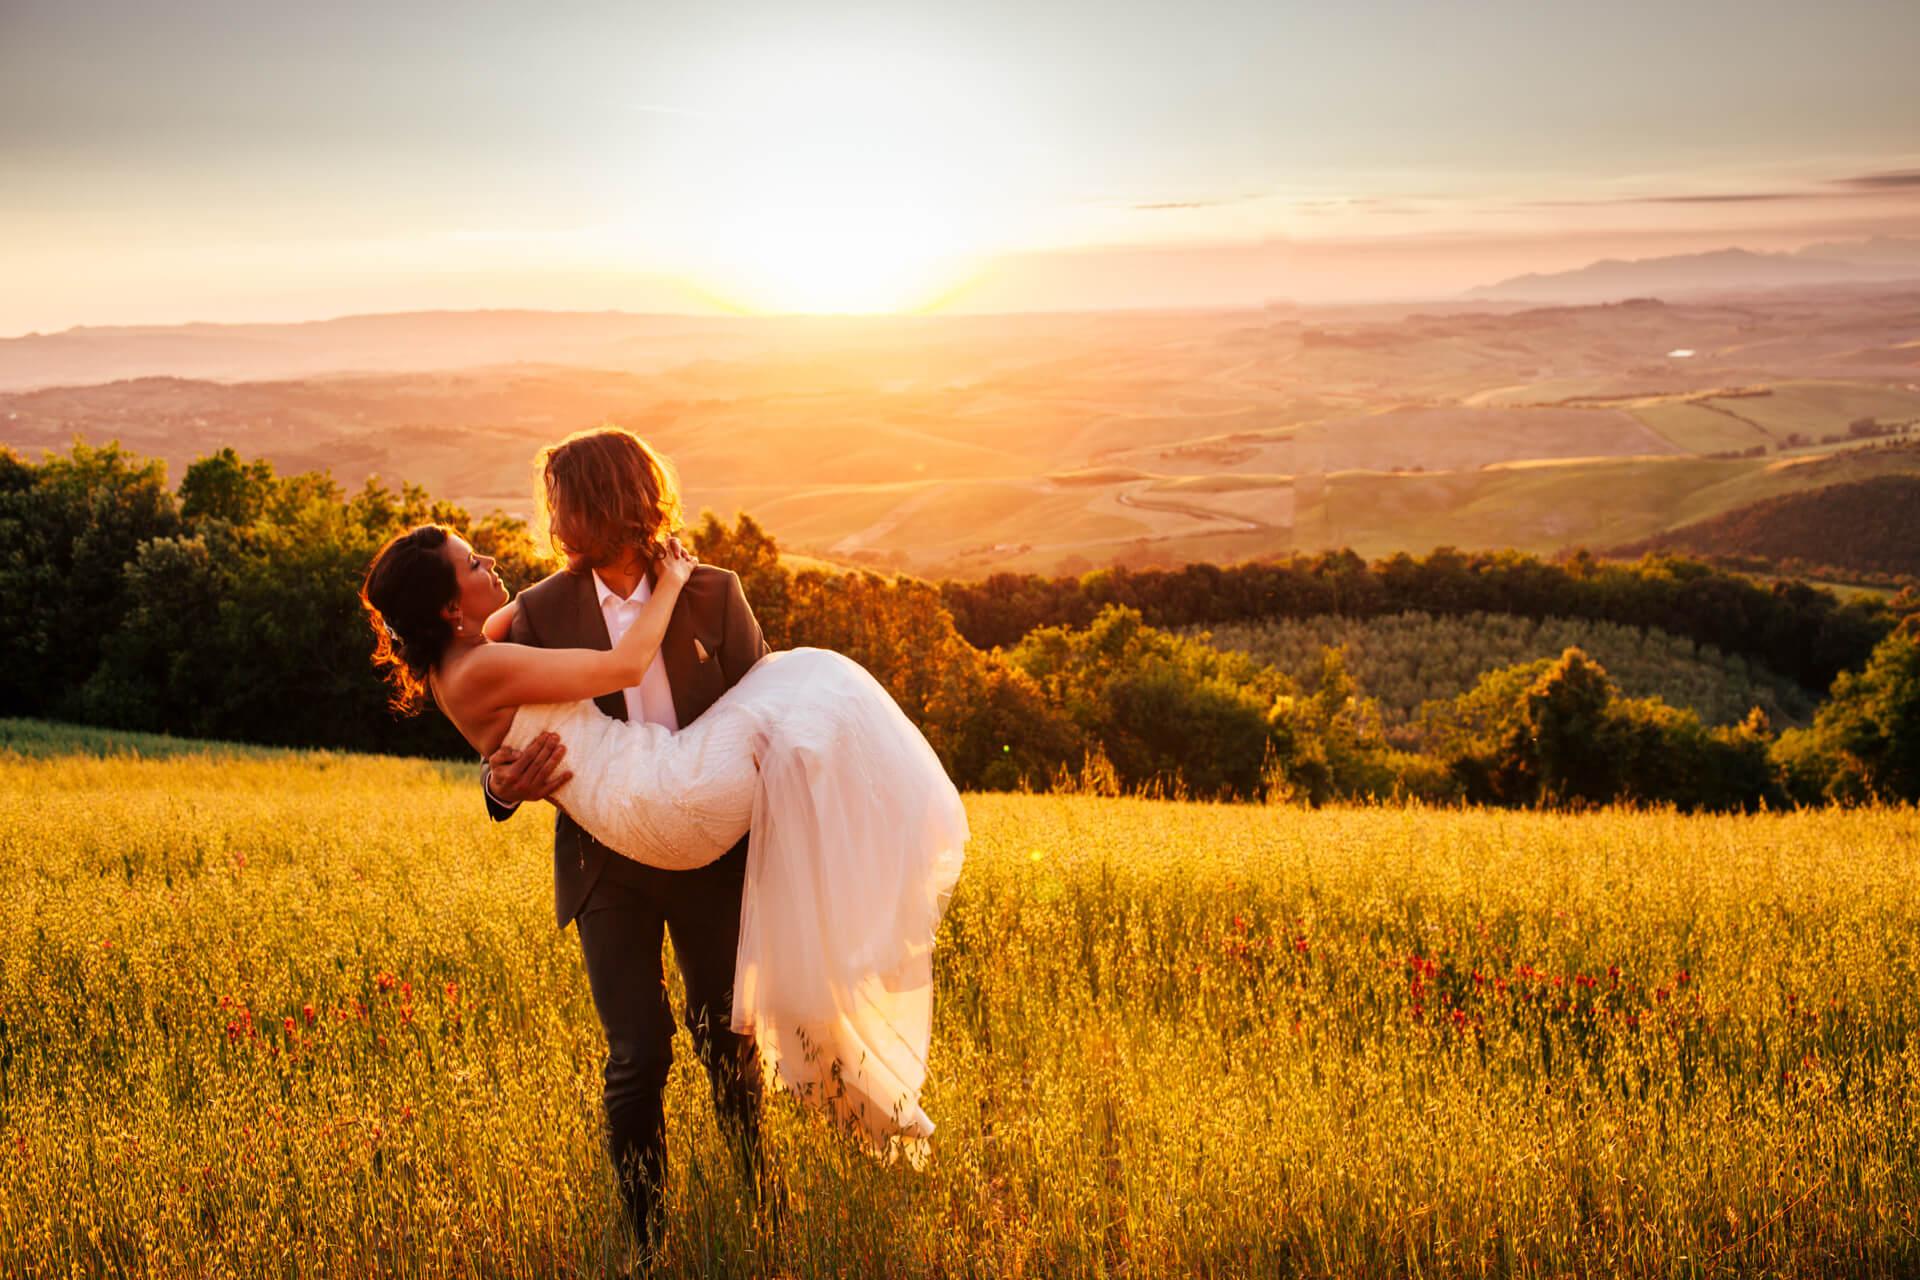 Emily_Little_Photography_Tuscany_Desntination_Wedding_Villa_Di_Ulignano_Italy-90